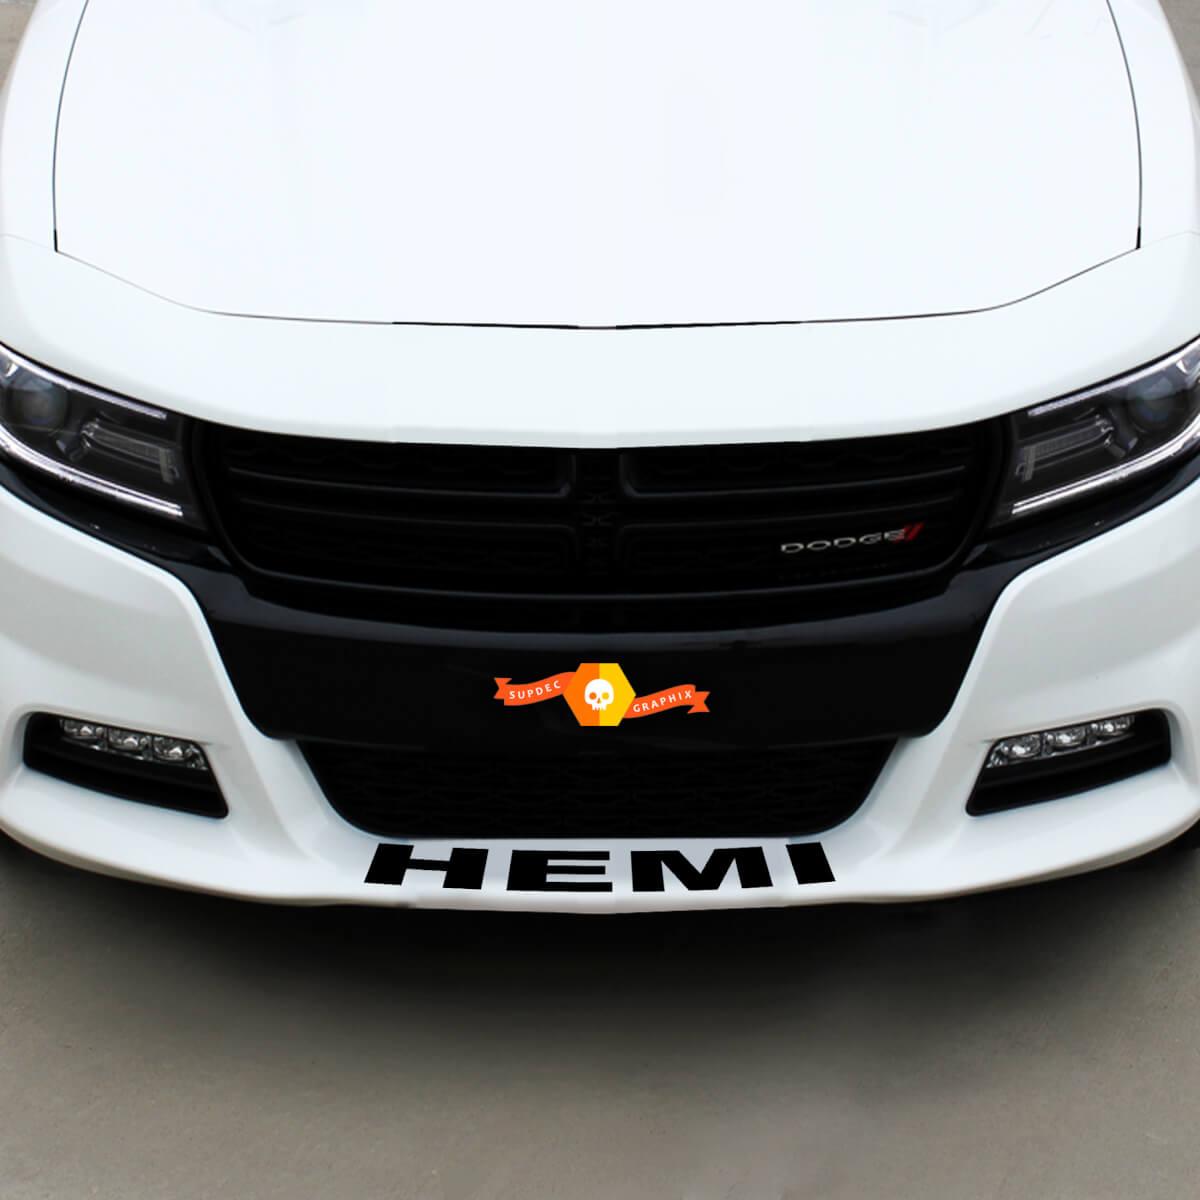 Dodge HEMI Front Spoiler Decal Sticker Grafik passt zu allen Modellen